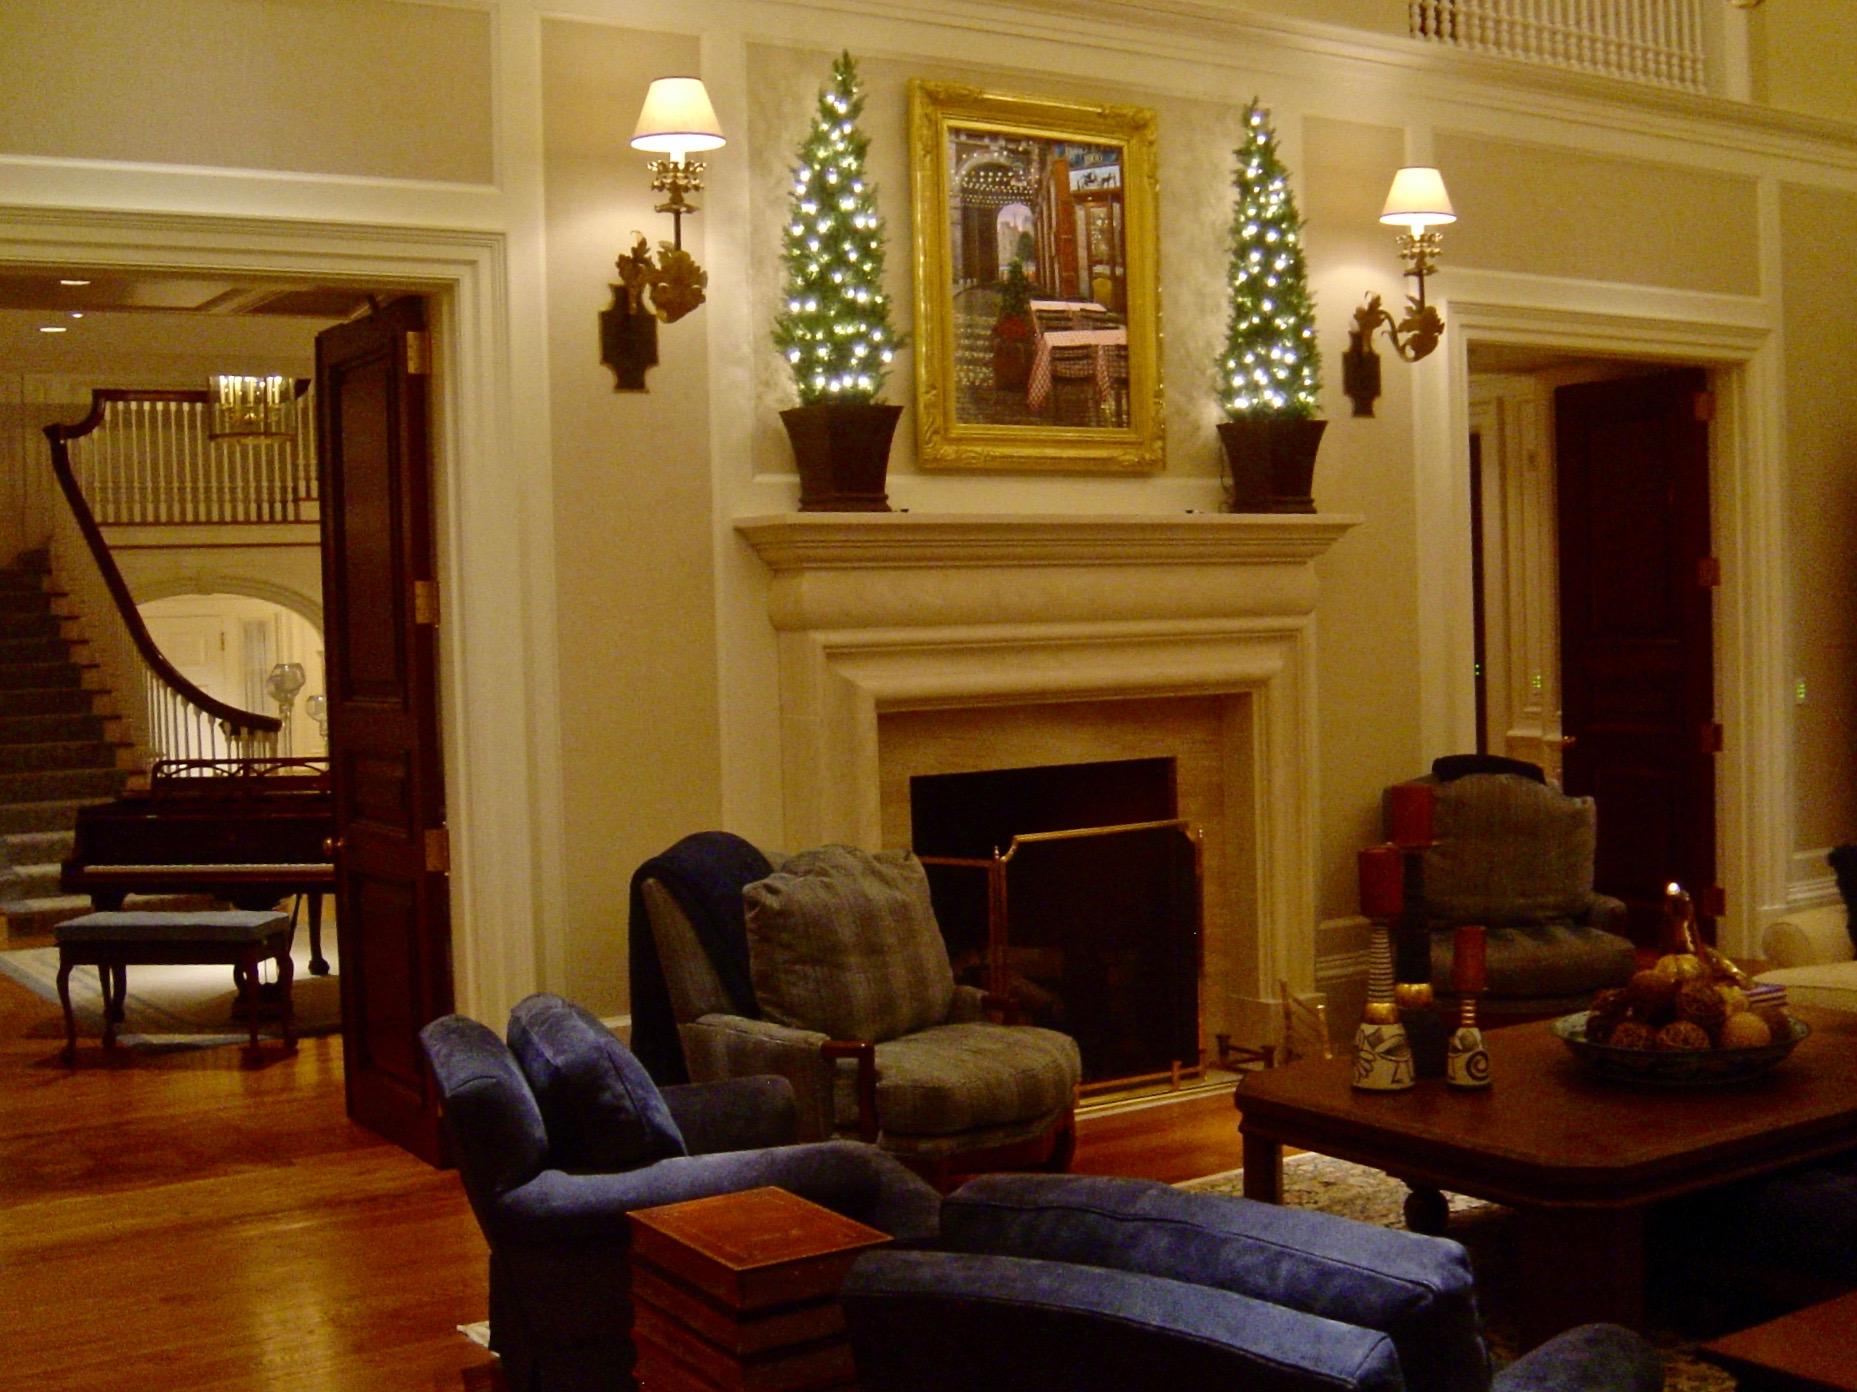 indoorlightinglivingroomresidentialelectrical1